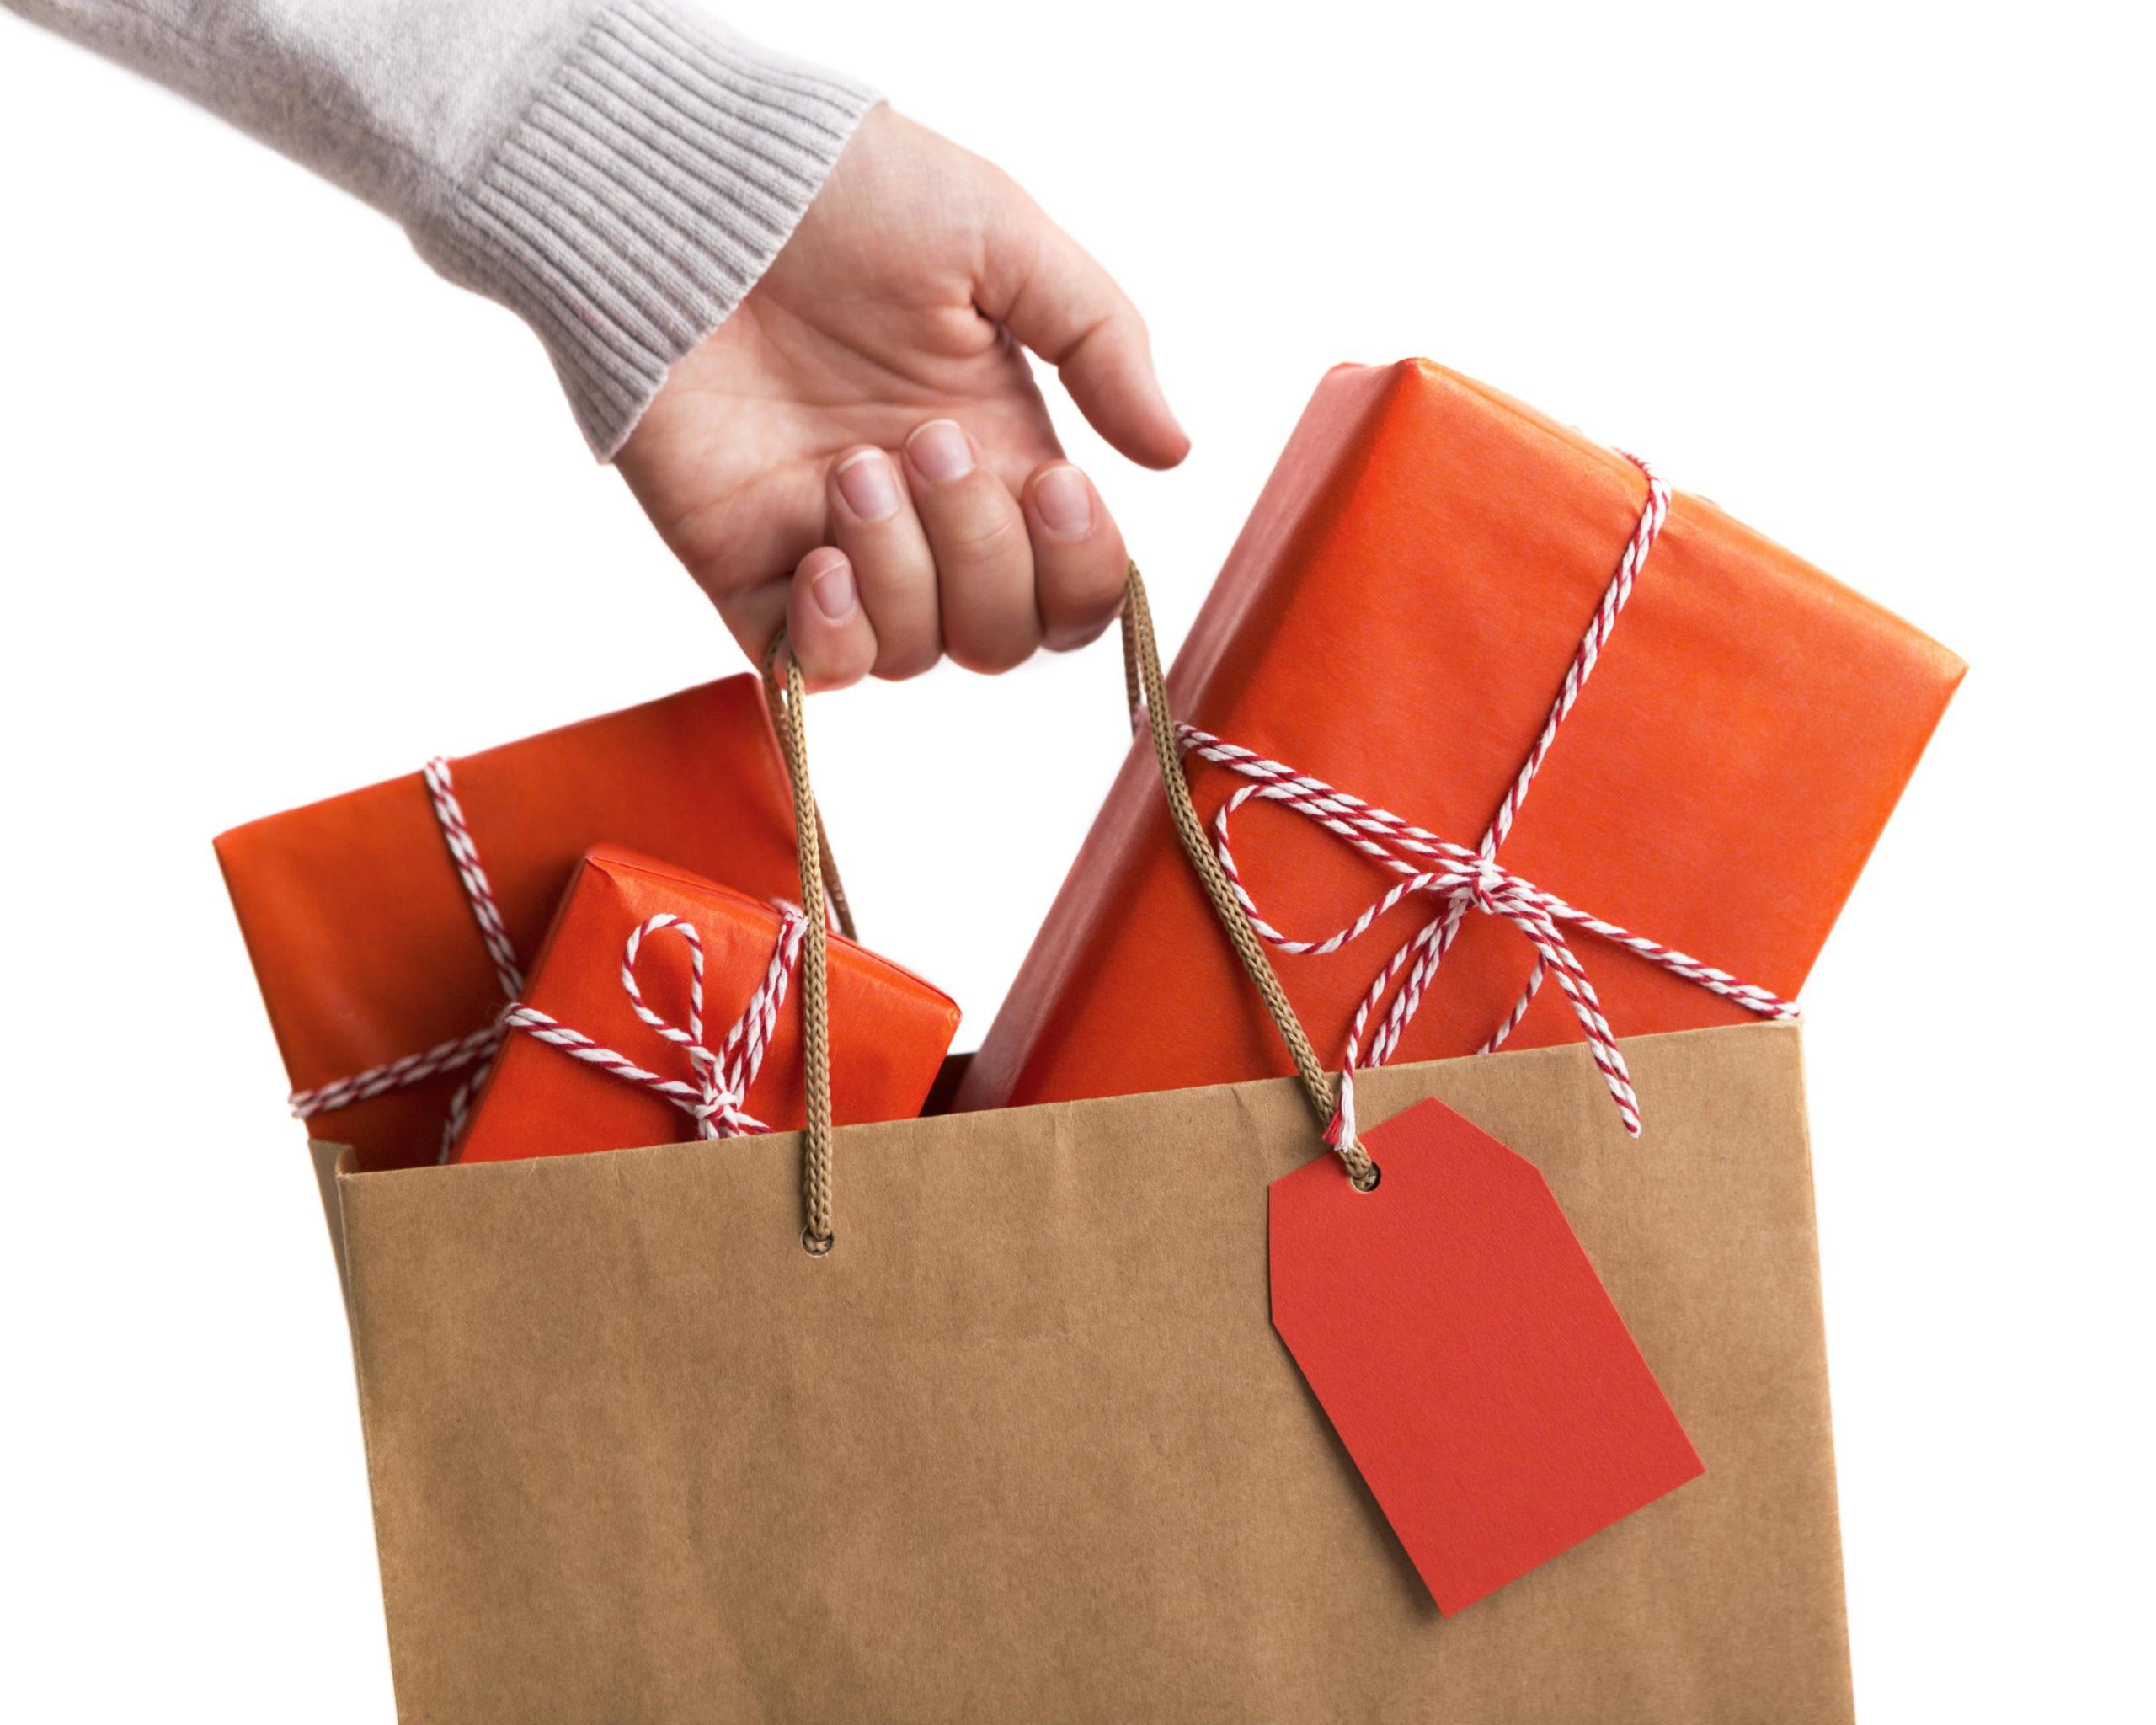 Manipulative Rhetorik Teil 4: Manipulationsfreier Verkauf